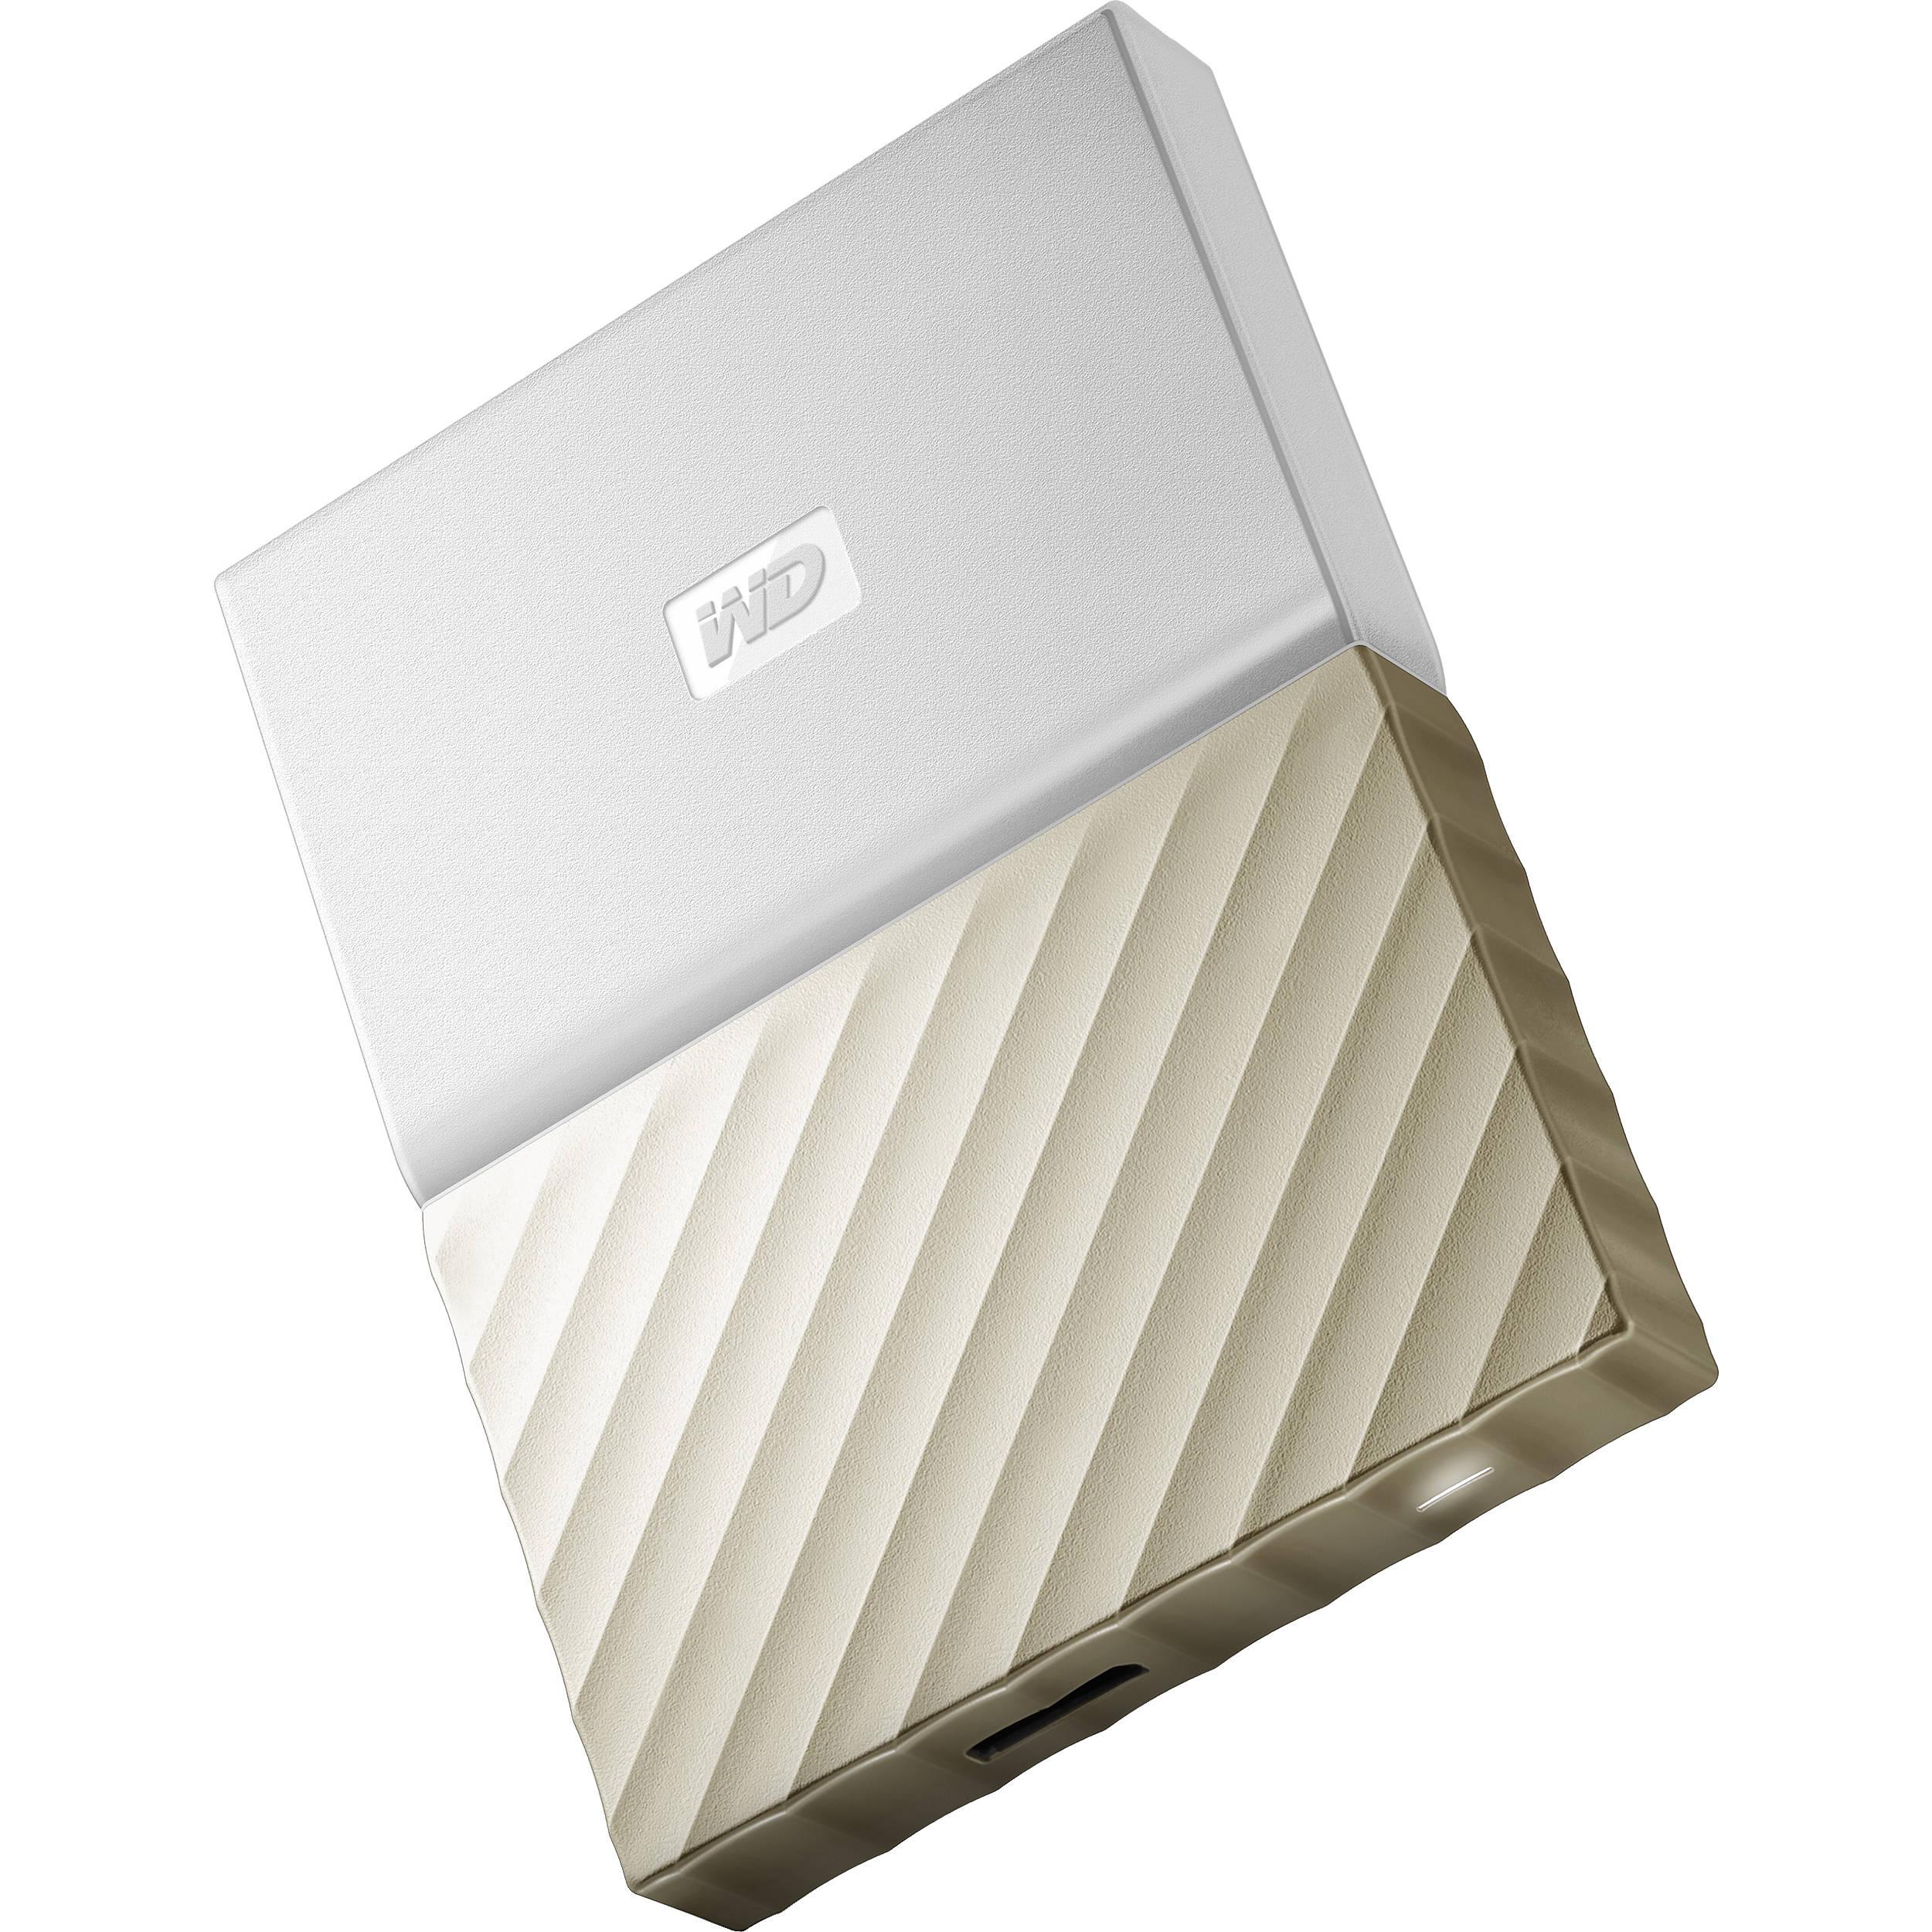 1TB My Passport Ultra USB 3 0 External Hard Drive (White/Gold)